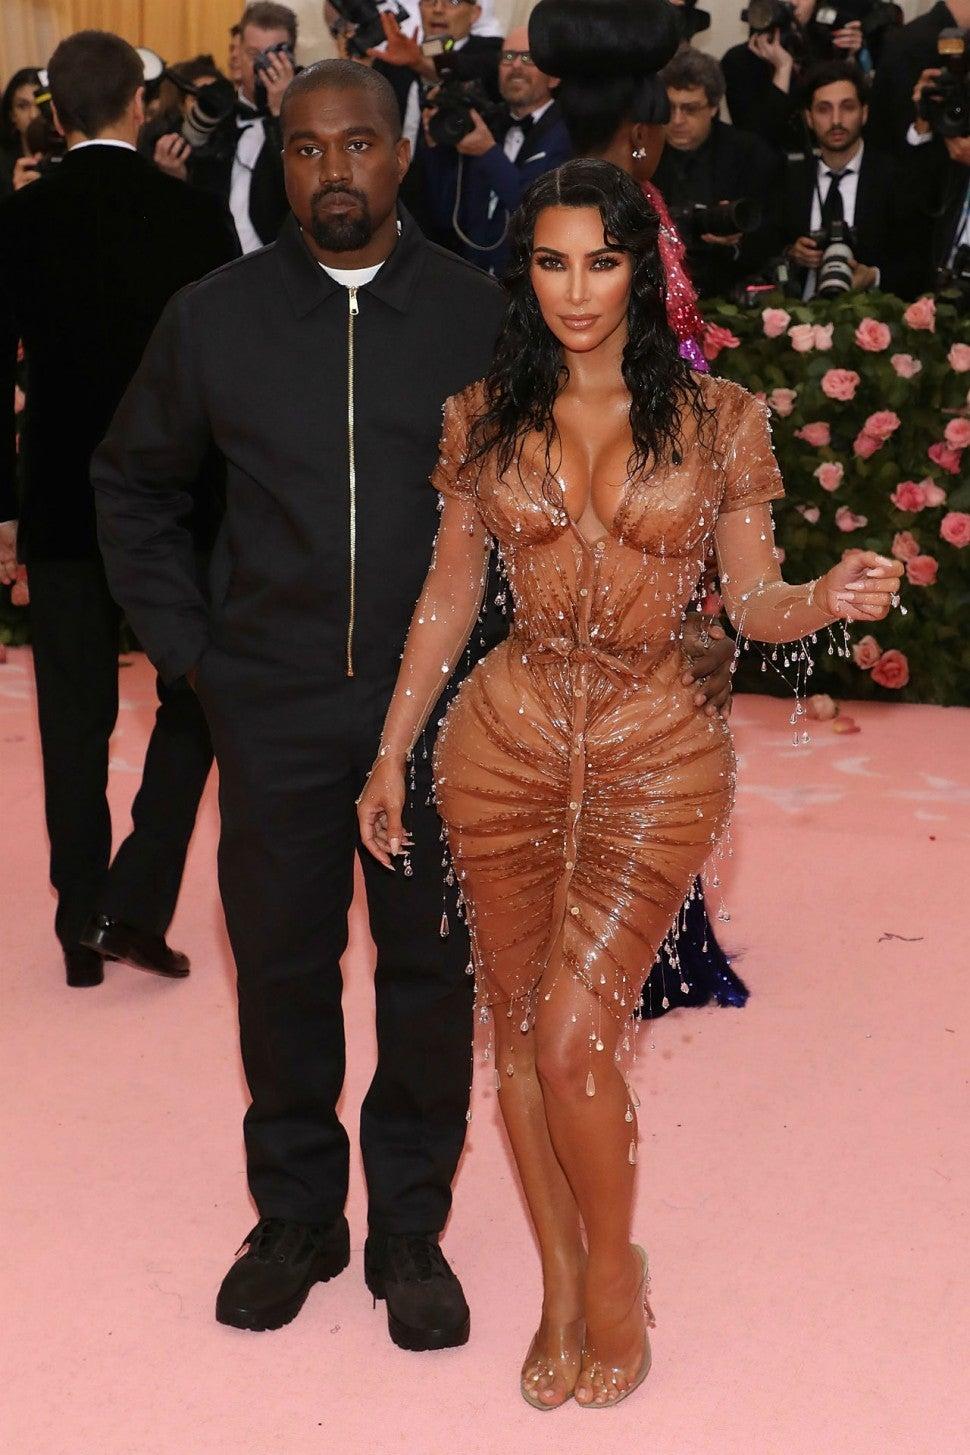 Kim Kardashian Shares Adorable Family Photos From Psalm